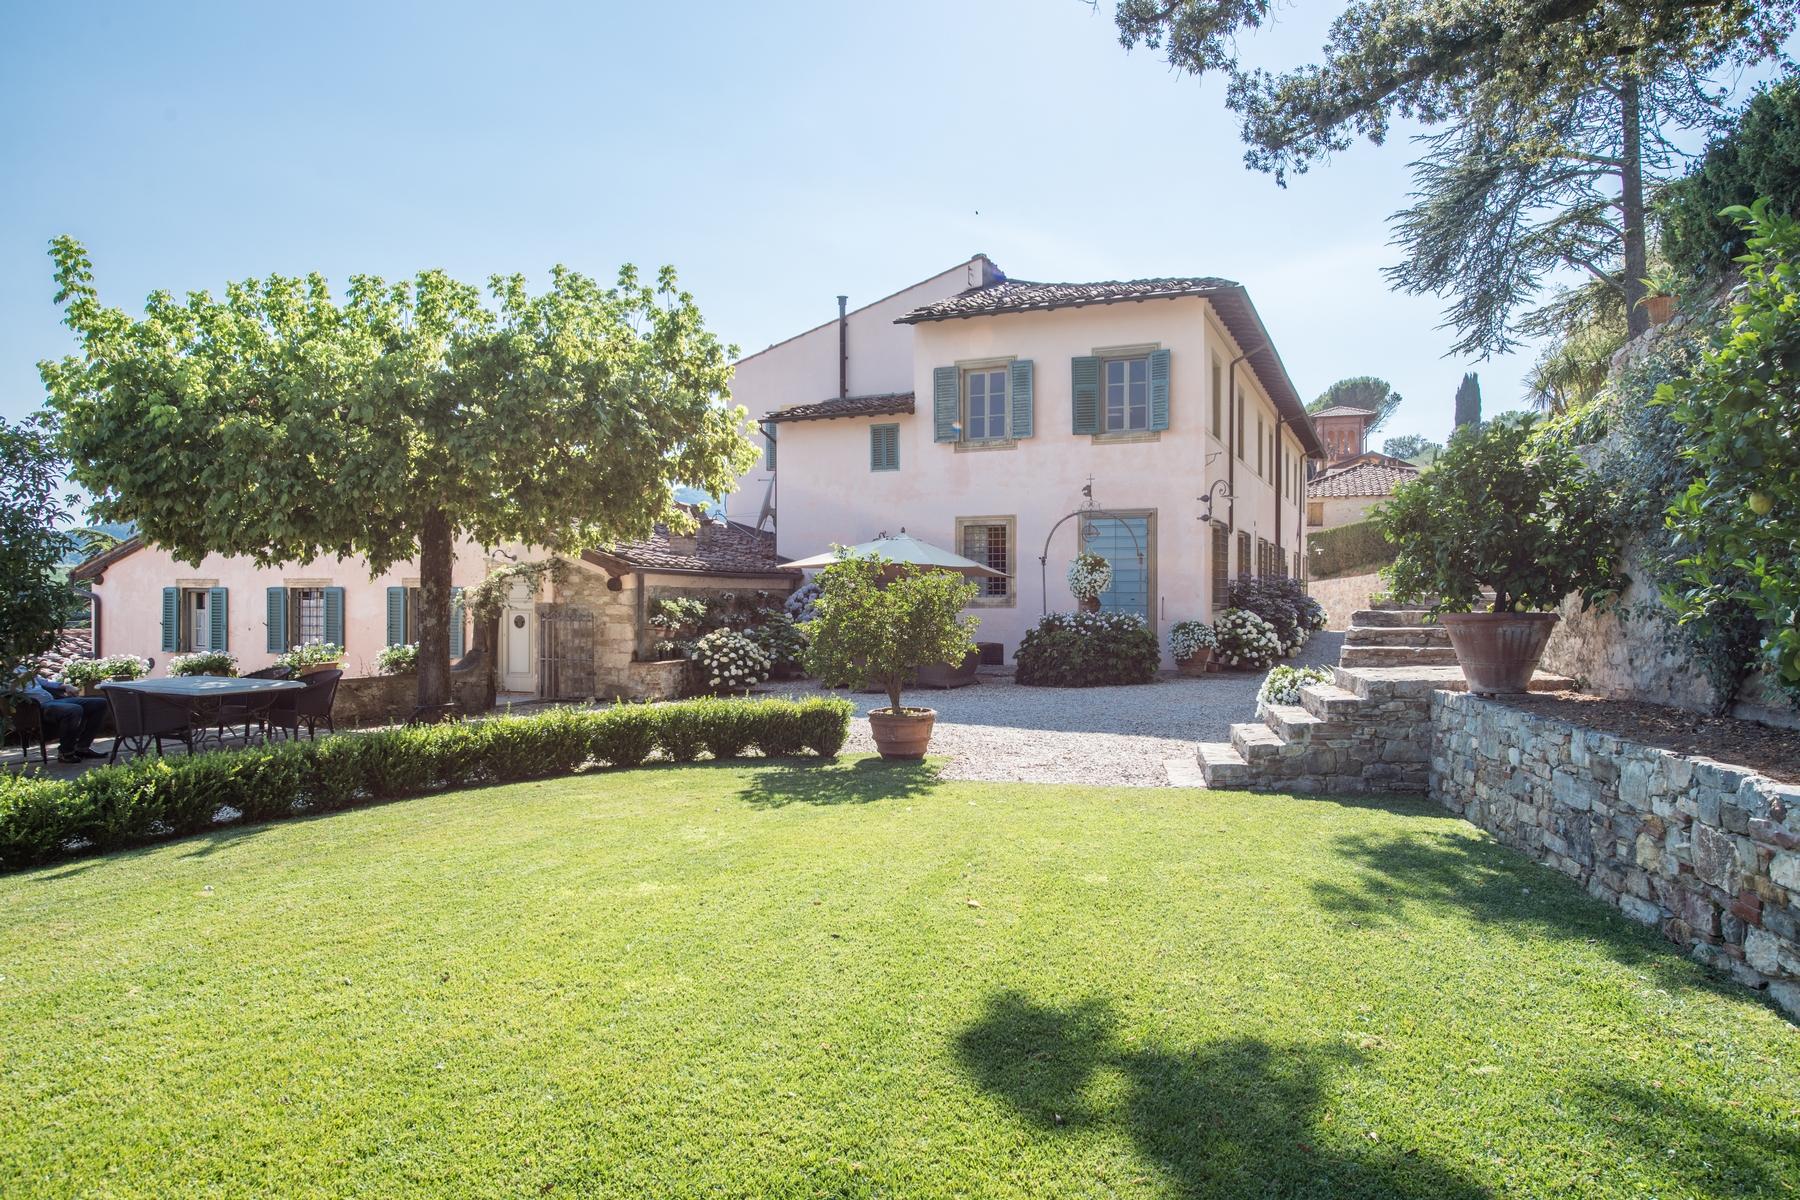 Villa in Vendita a Lucca: 5 locali, 2500 mq - Foto 17